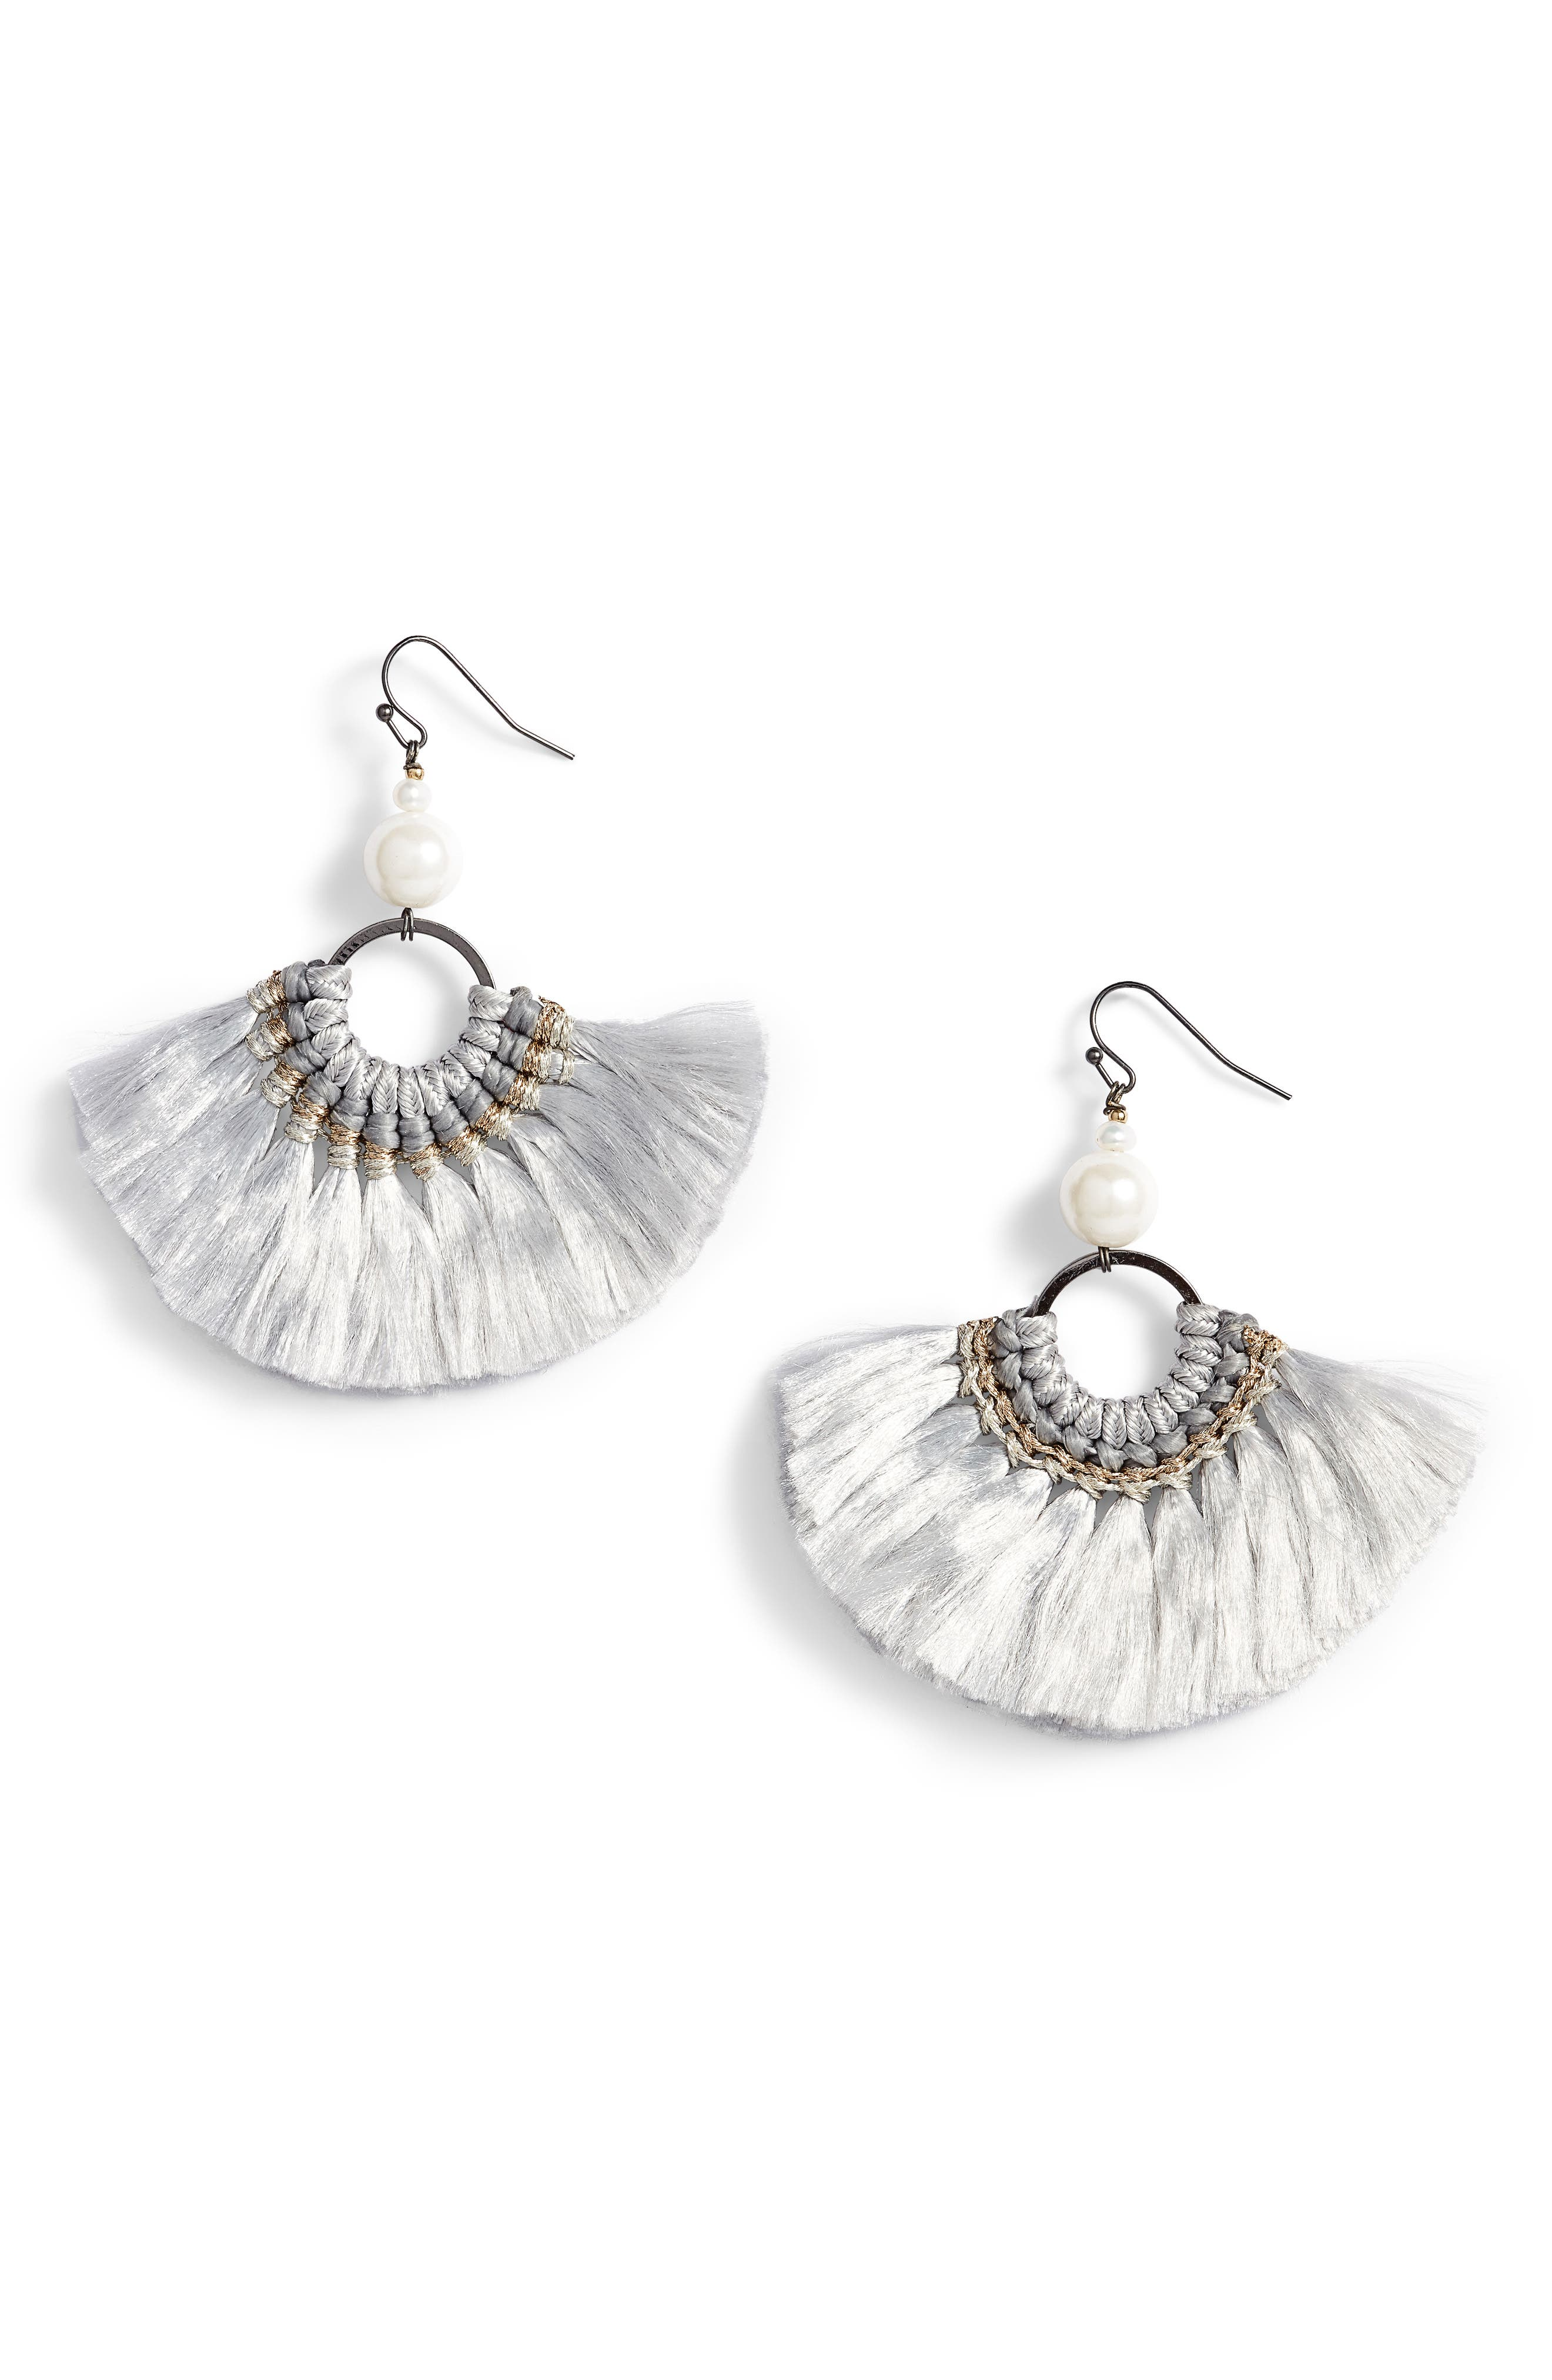 Main Image - Nakamol Design Tassel Pearl Earrings